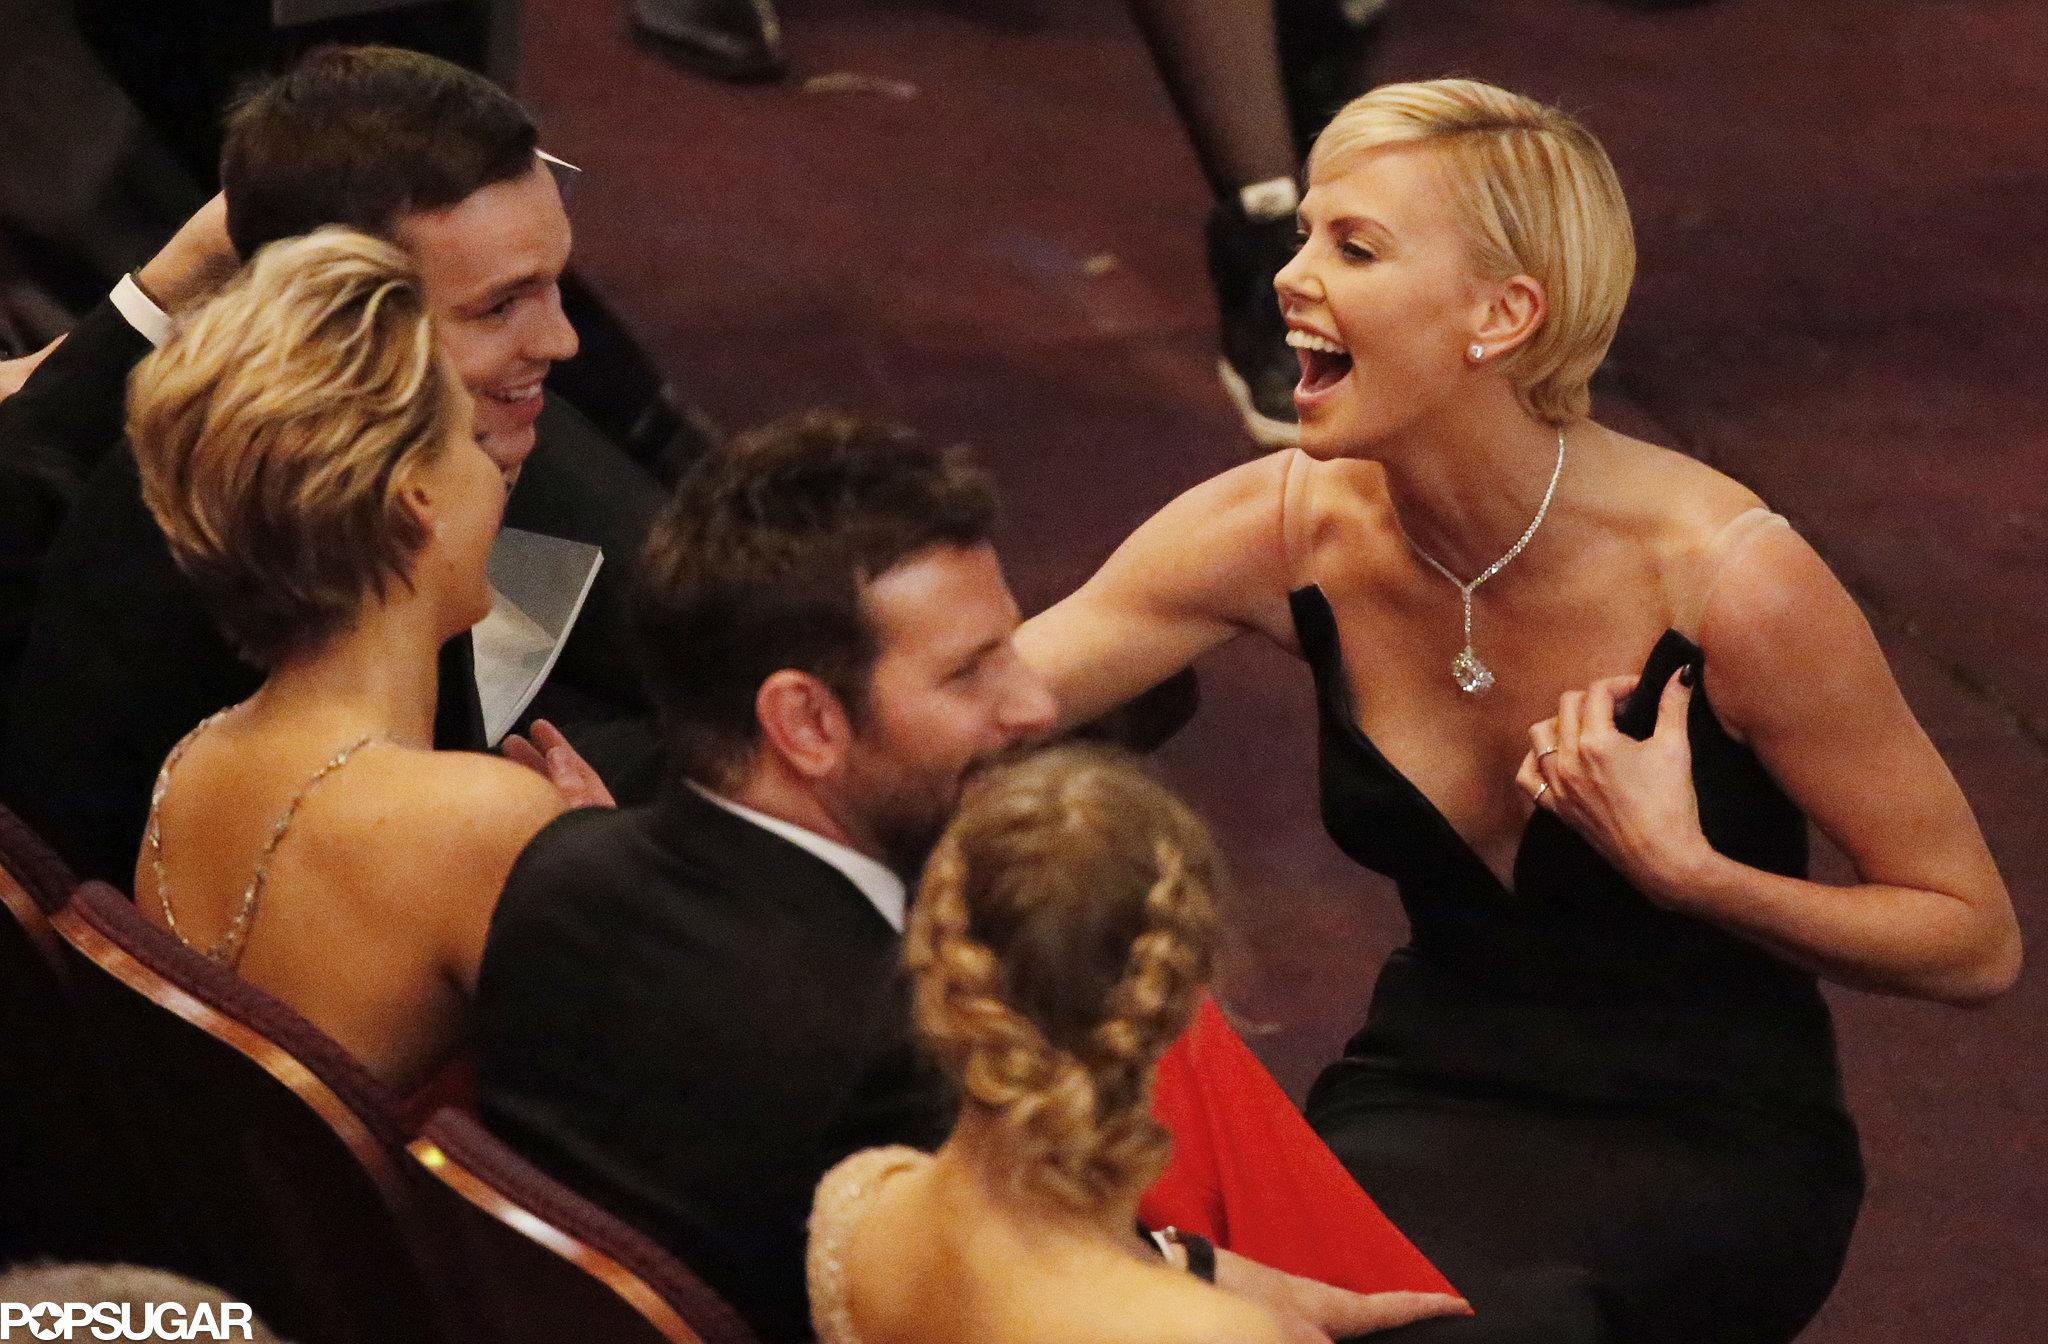 Jennifer Lawrence Brought Boyfriend Nicholas Hoult to the Oscars